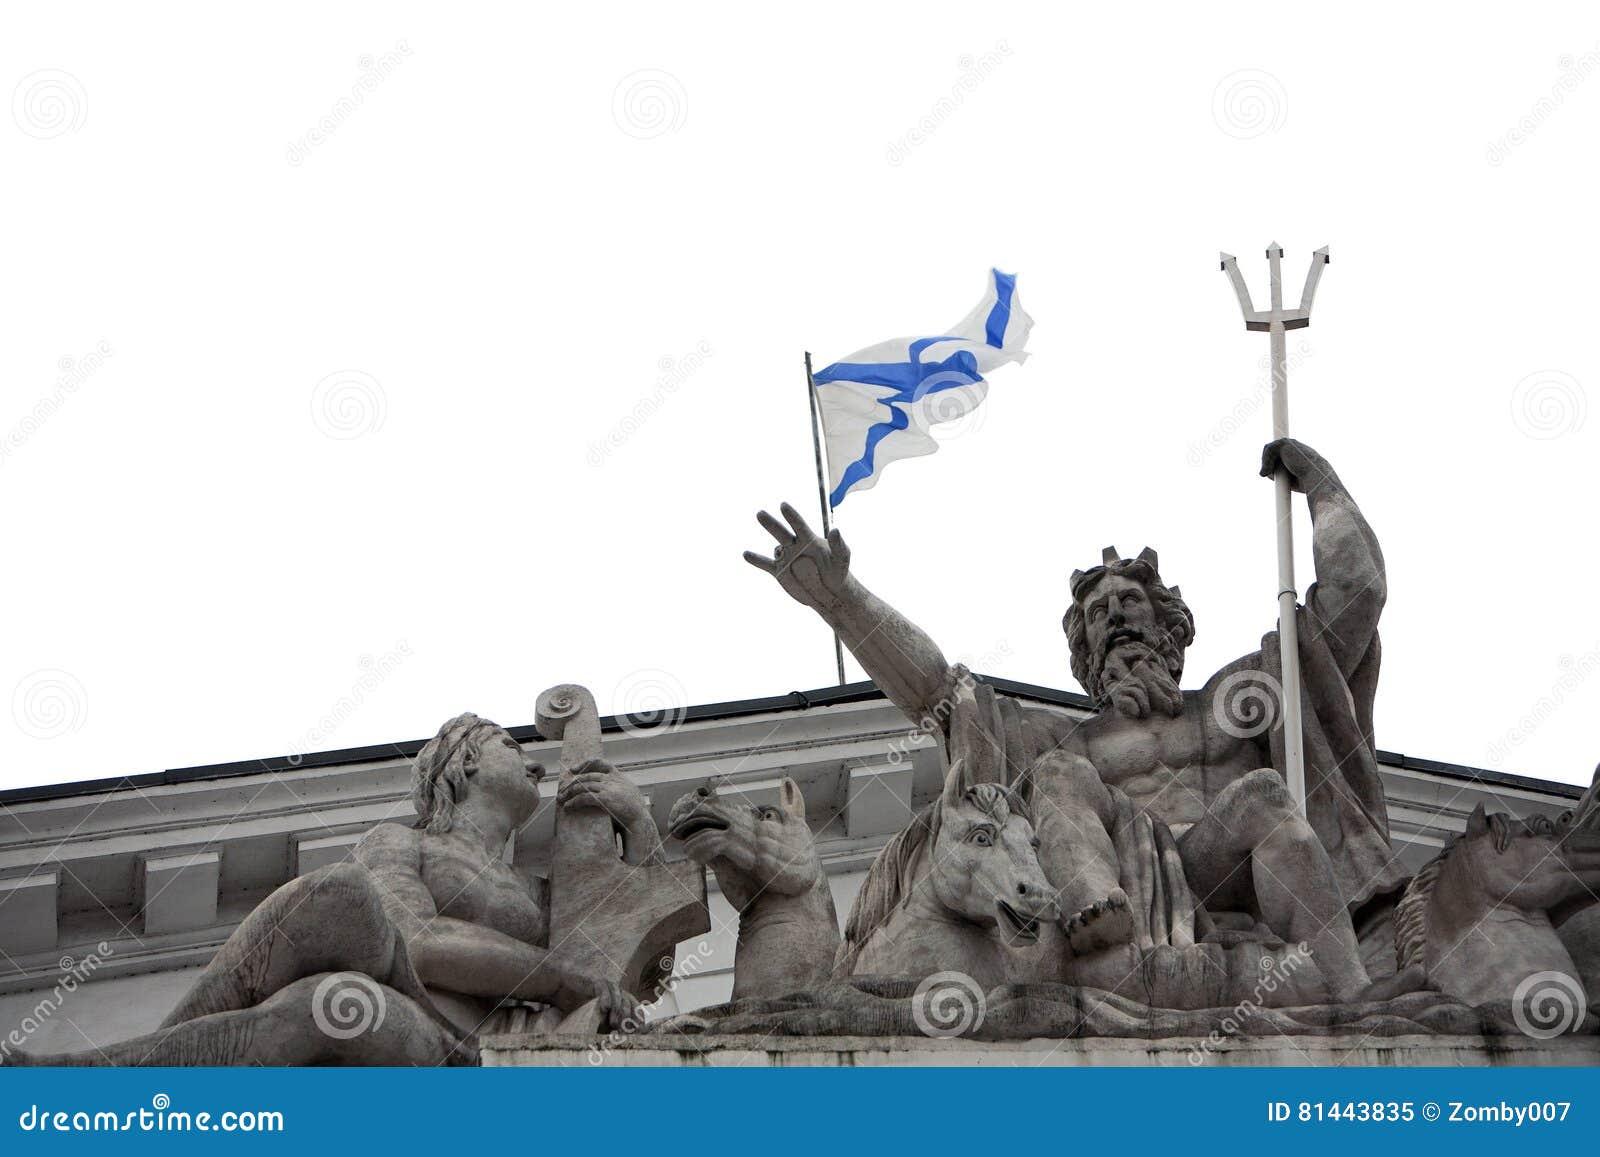 Neptune and the flag of st andrew stock image image of place royalty free stock photo buycottarizona